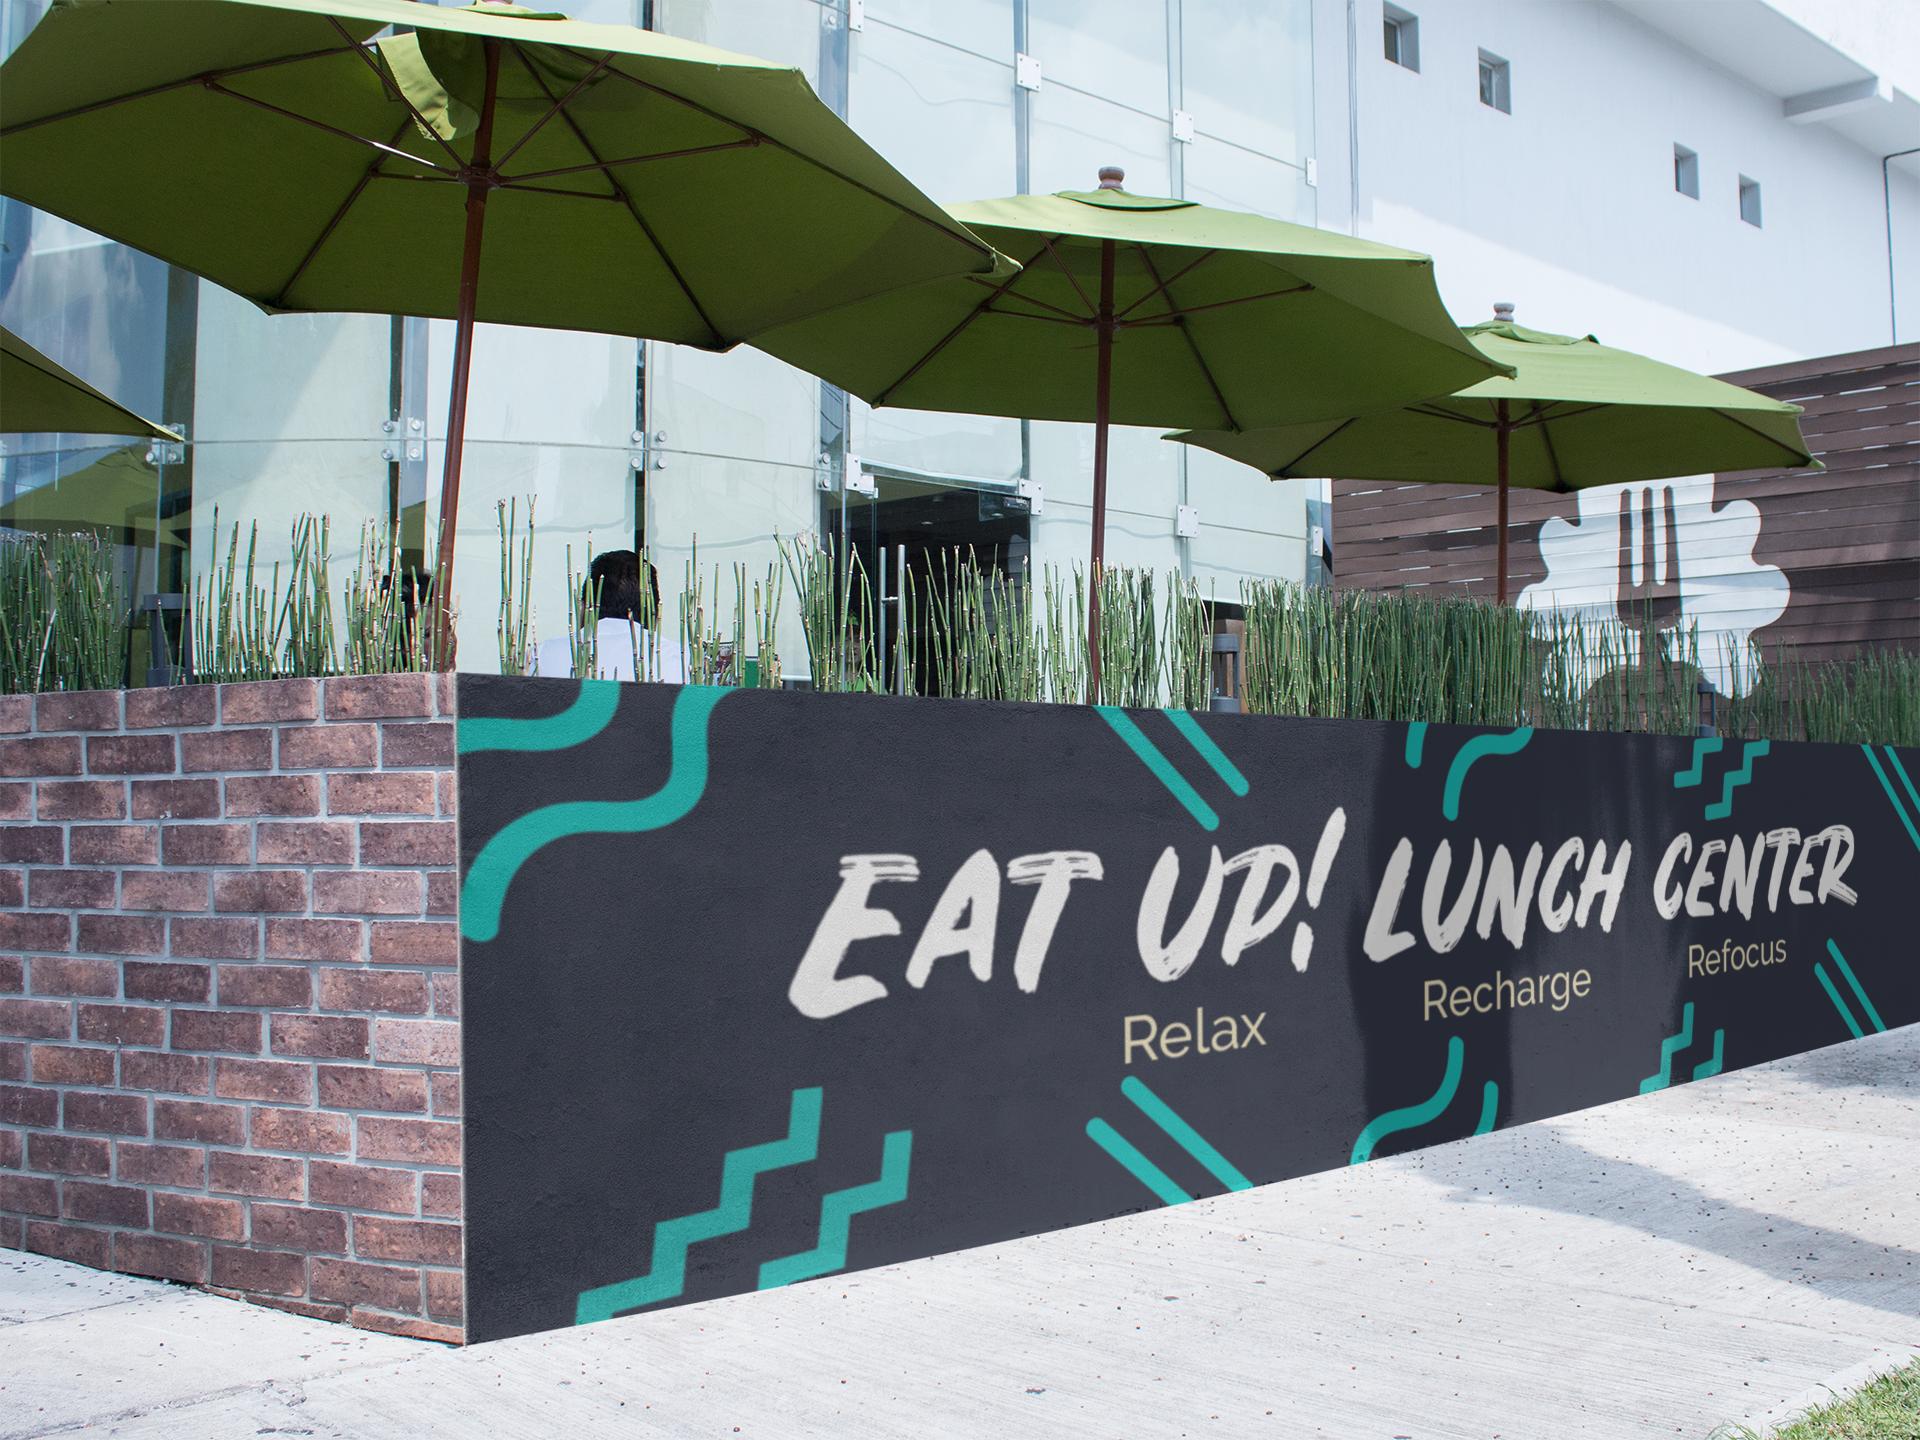 horizontal-banner-mockup-outside-a-restaurant-a10858.png